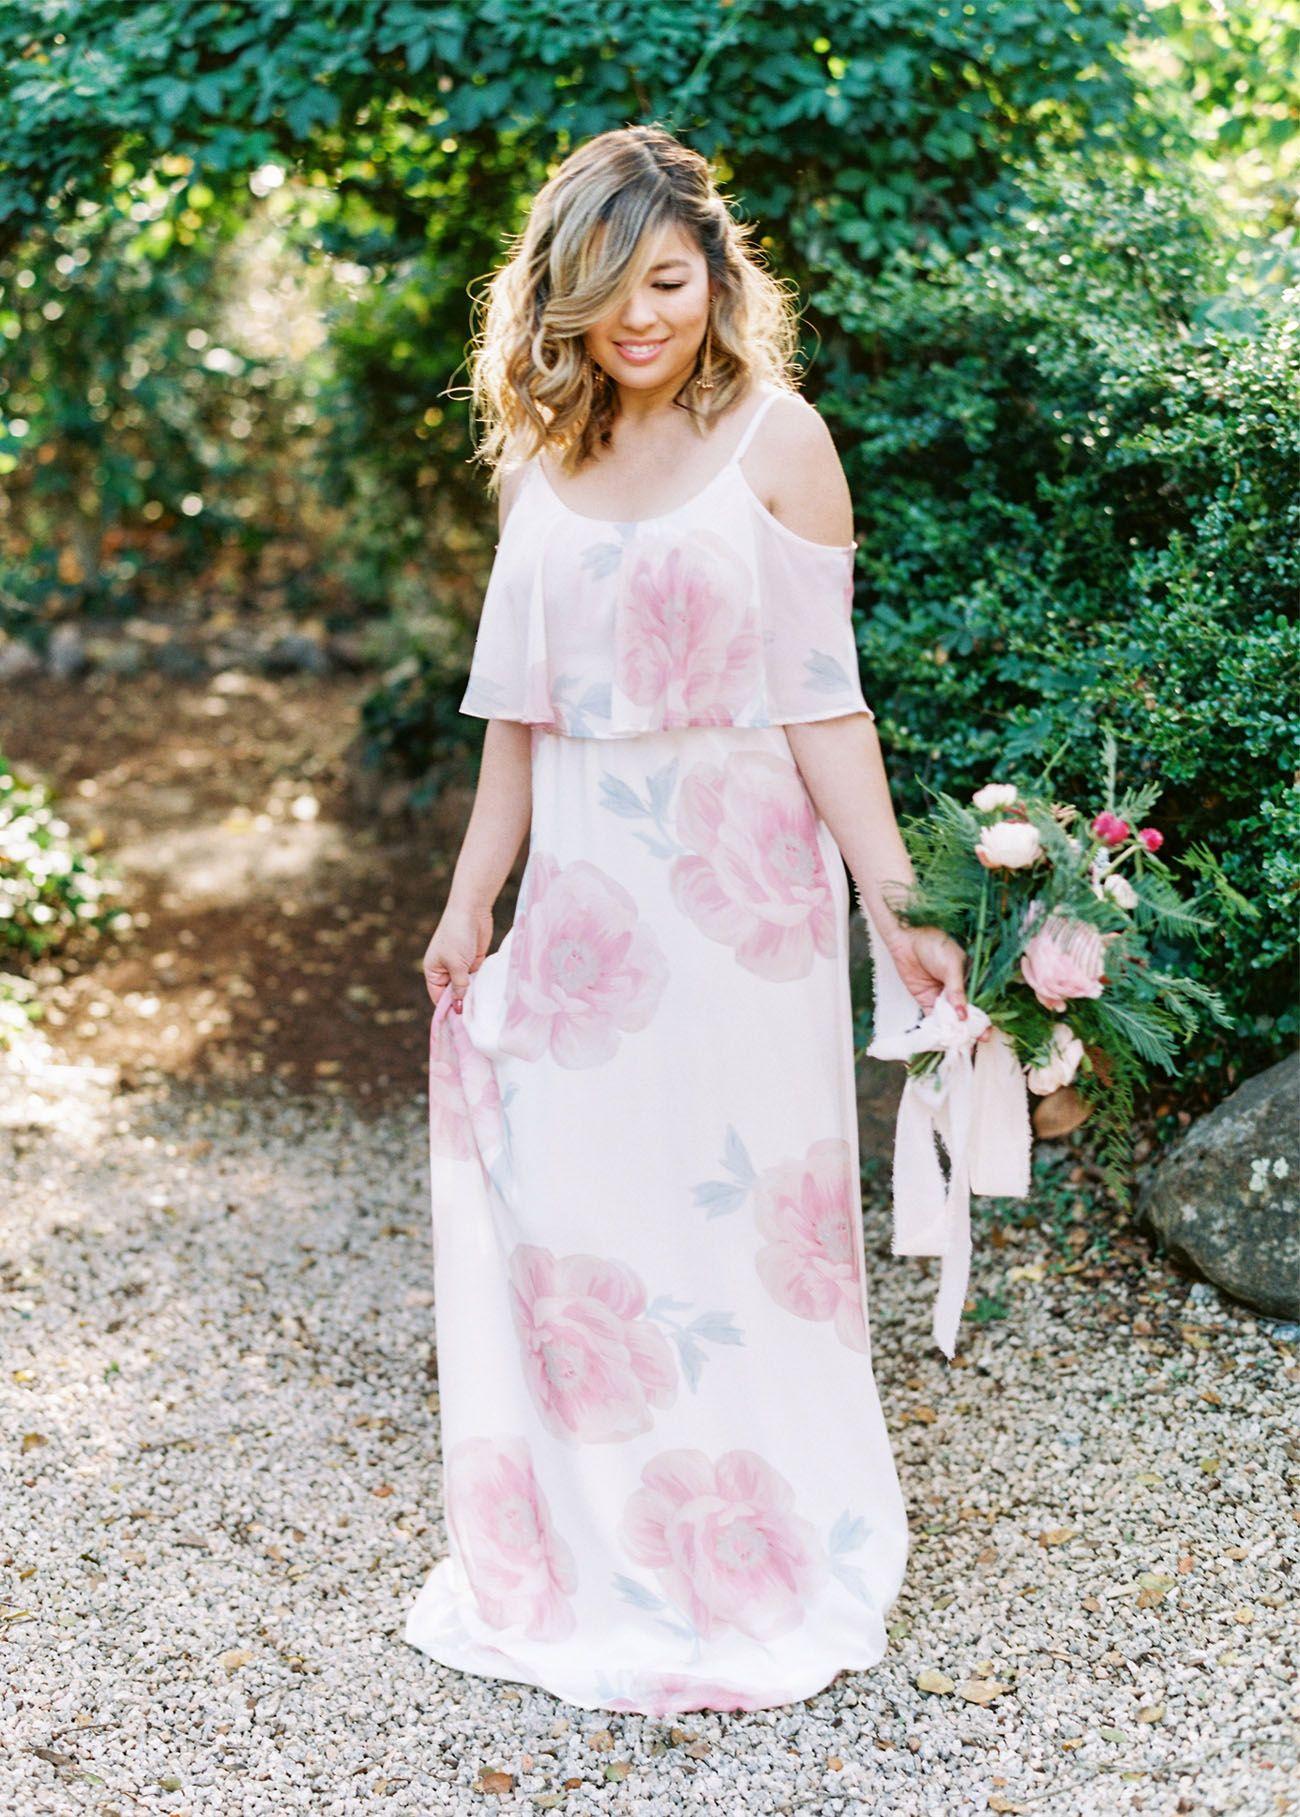 869333c9235 Green Wedding Shoes x Show Me Your Mumu Wedding Bells Spring Launch     Dusty Rose Blush Pink Sage Romantic Mix and Match Bridesmaid Dress   bridesmaid ...